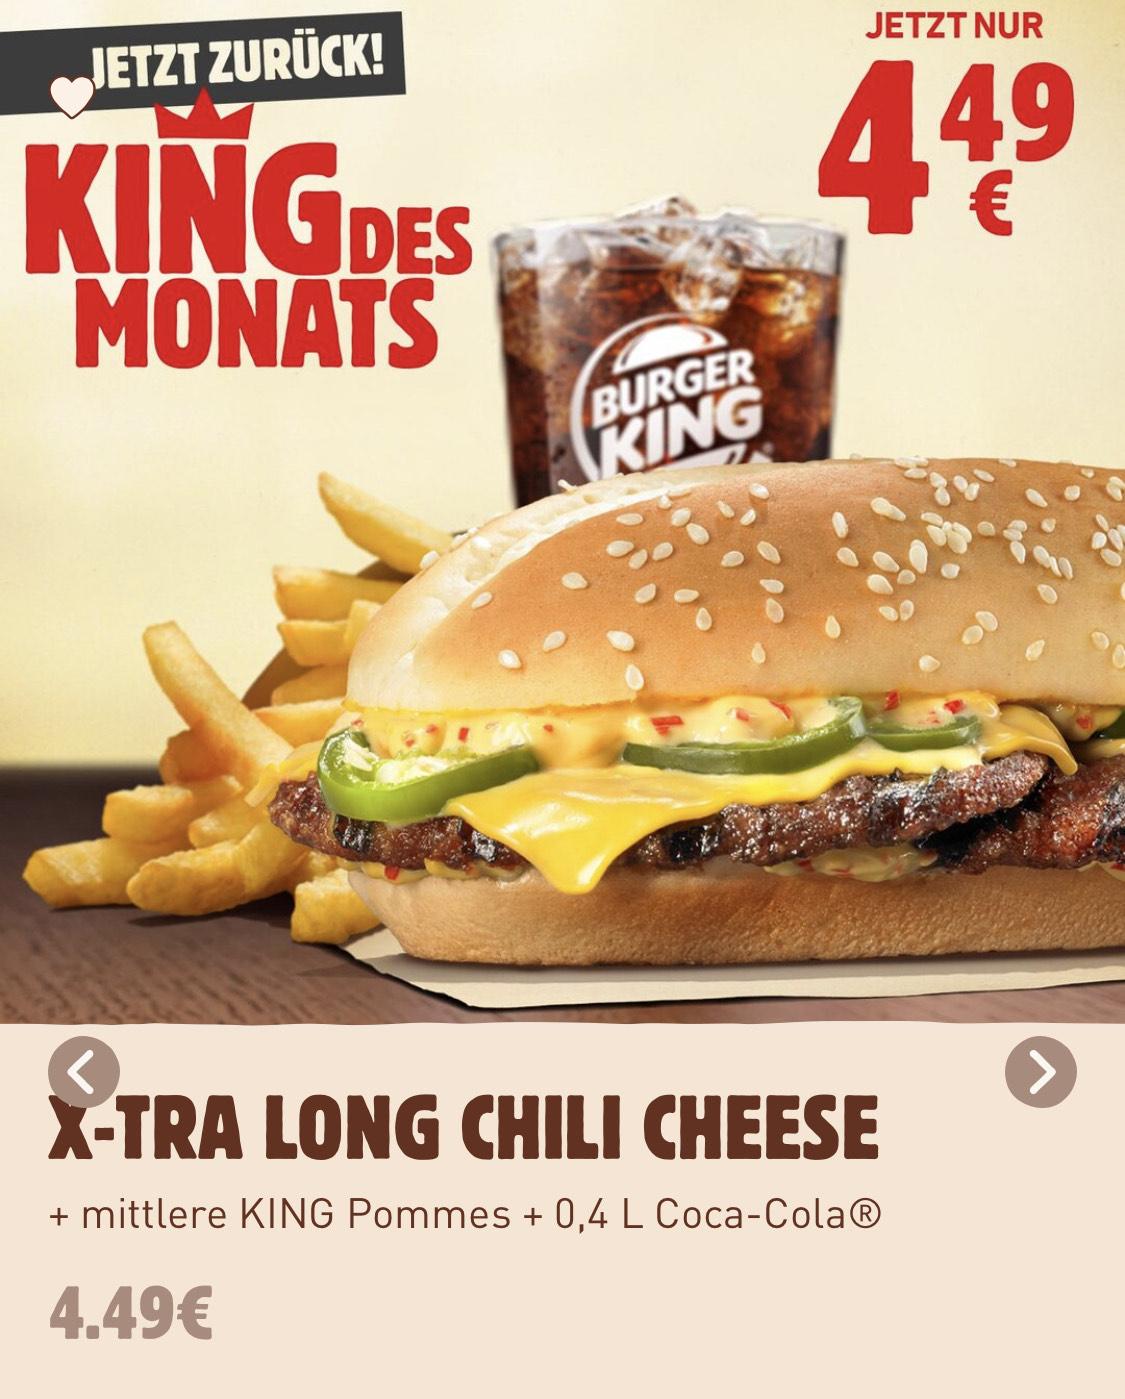 Lokal? - King des Monats X-Tra Long Chili Cheese (ausgewählte Restaurants / Bremen)